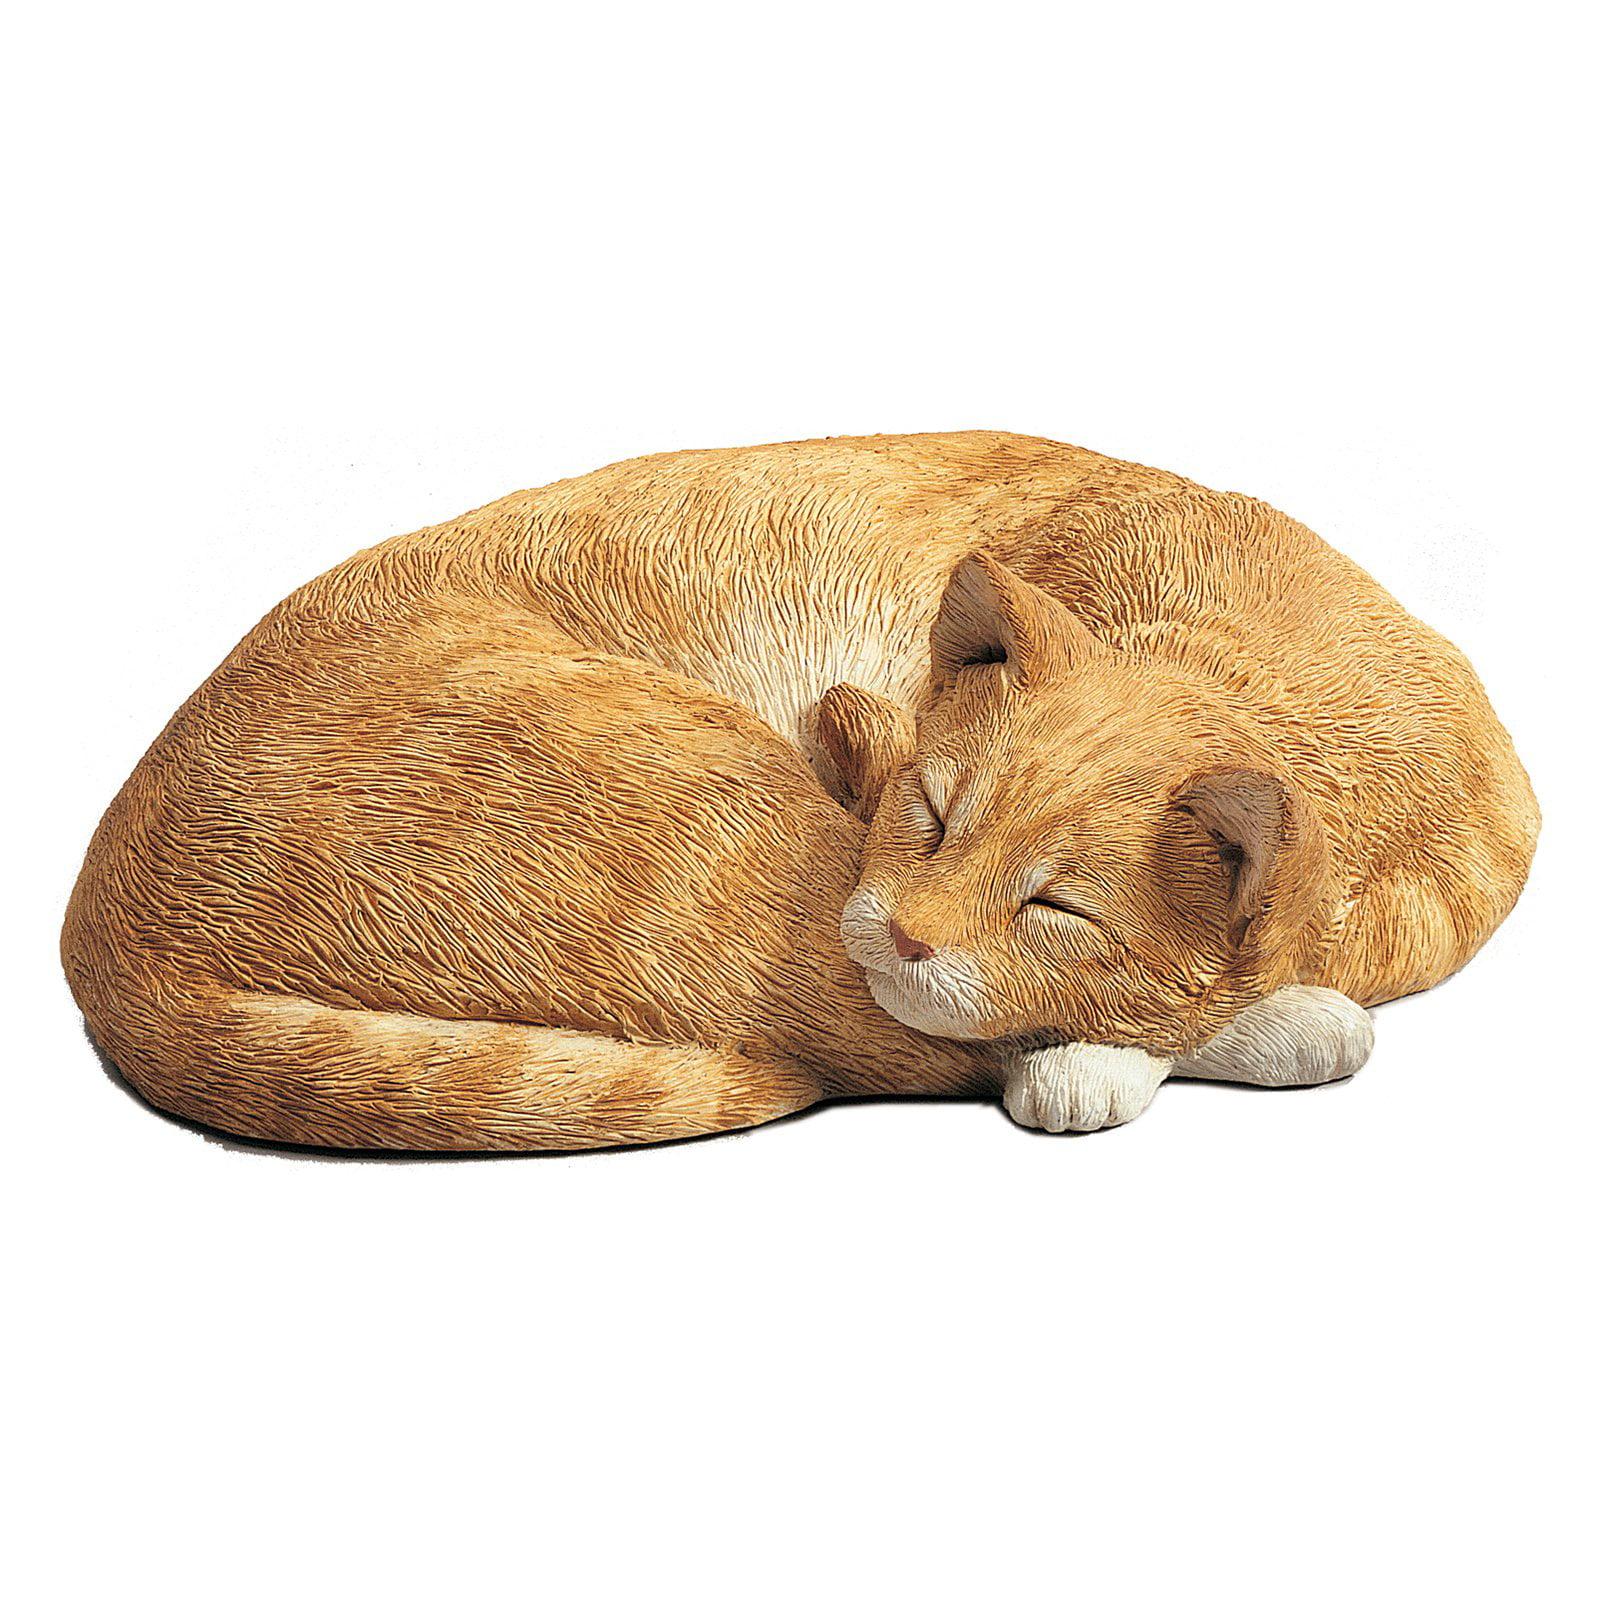 Sandicast Life Size Sculptures Cat Figurine